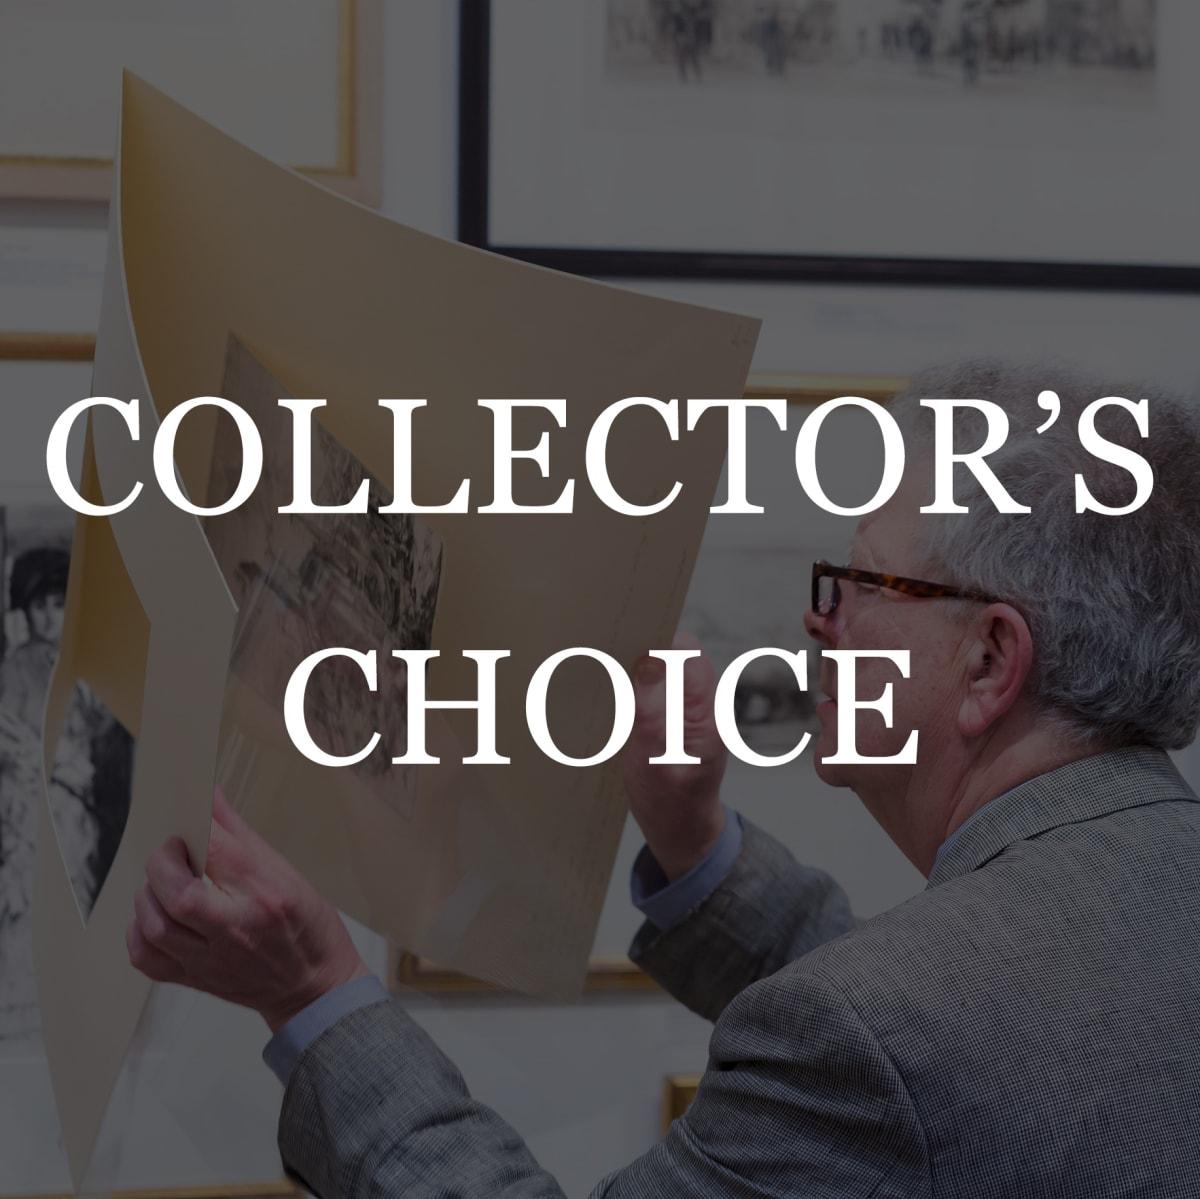 Collector's Choice